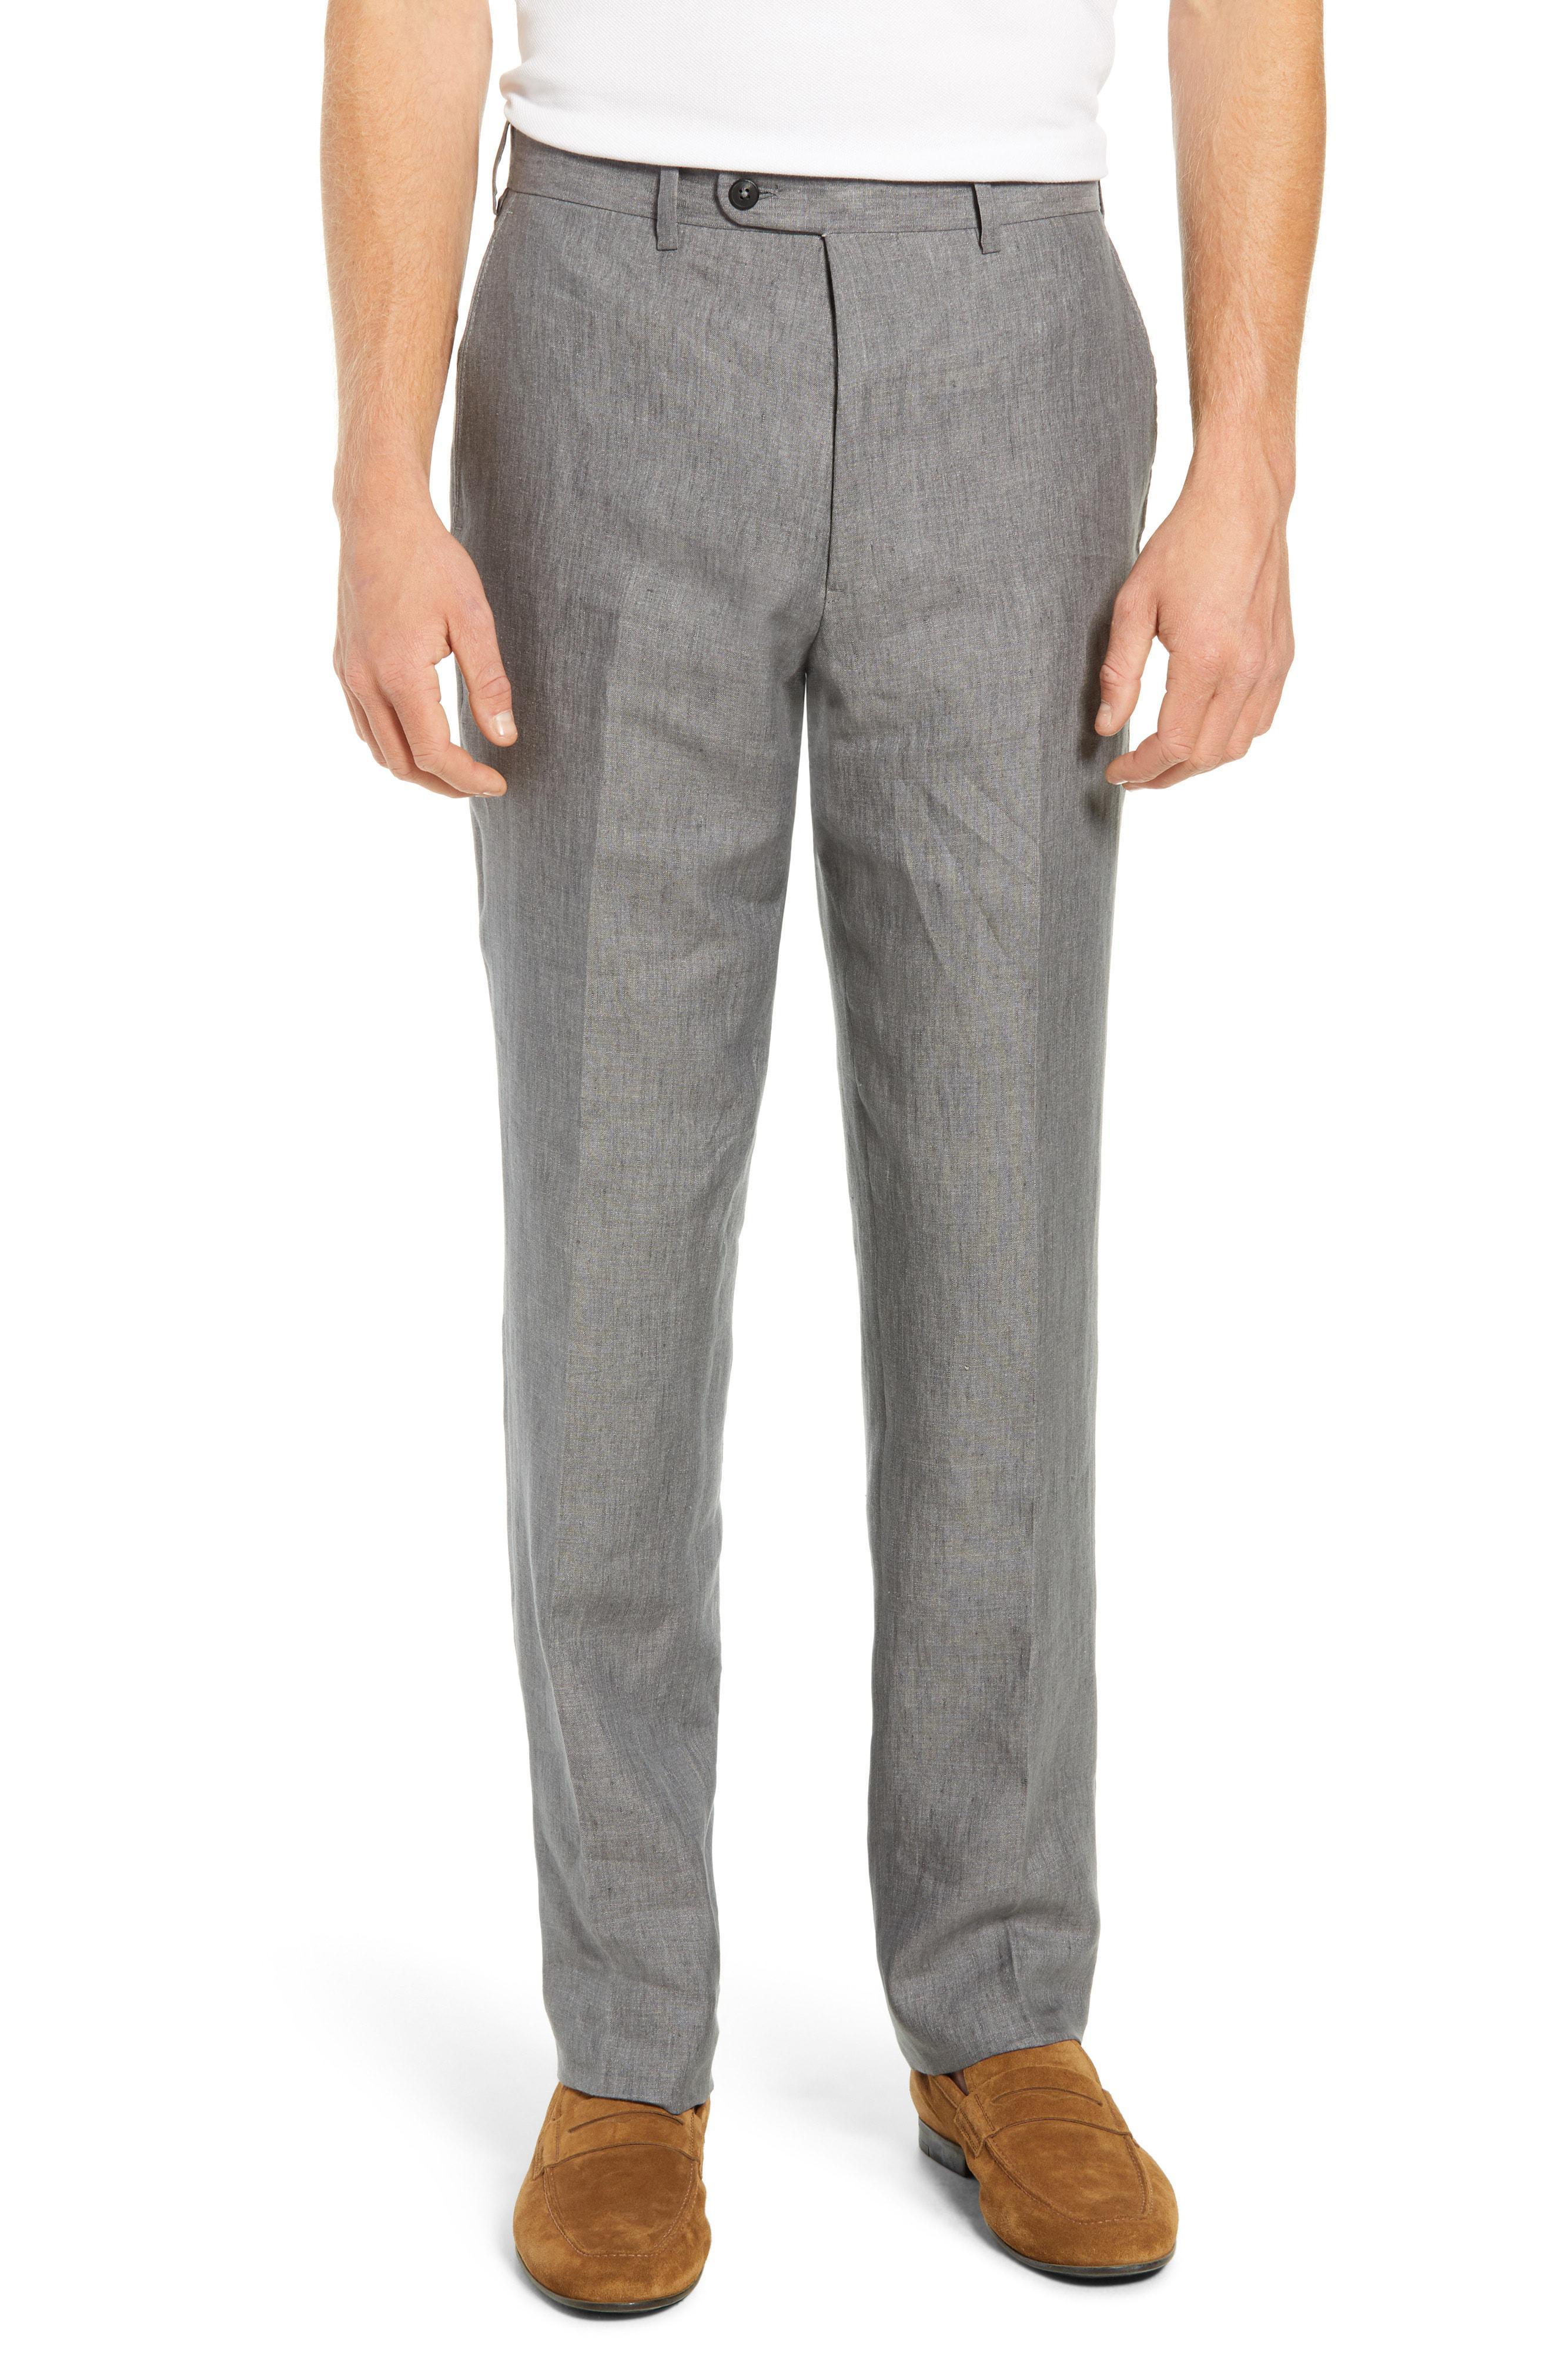 95d0e3a11d703 John W. Nordstrom. Men s Gray John W. Nordstrom Torino Flat Front Solid  Linen Trousers